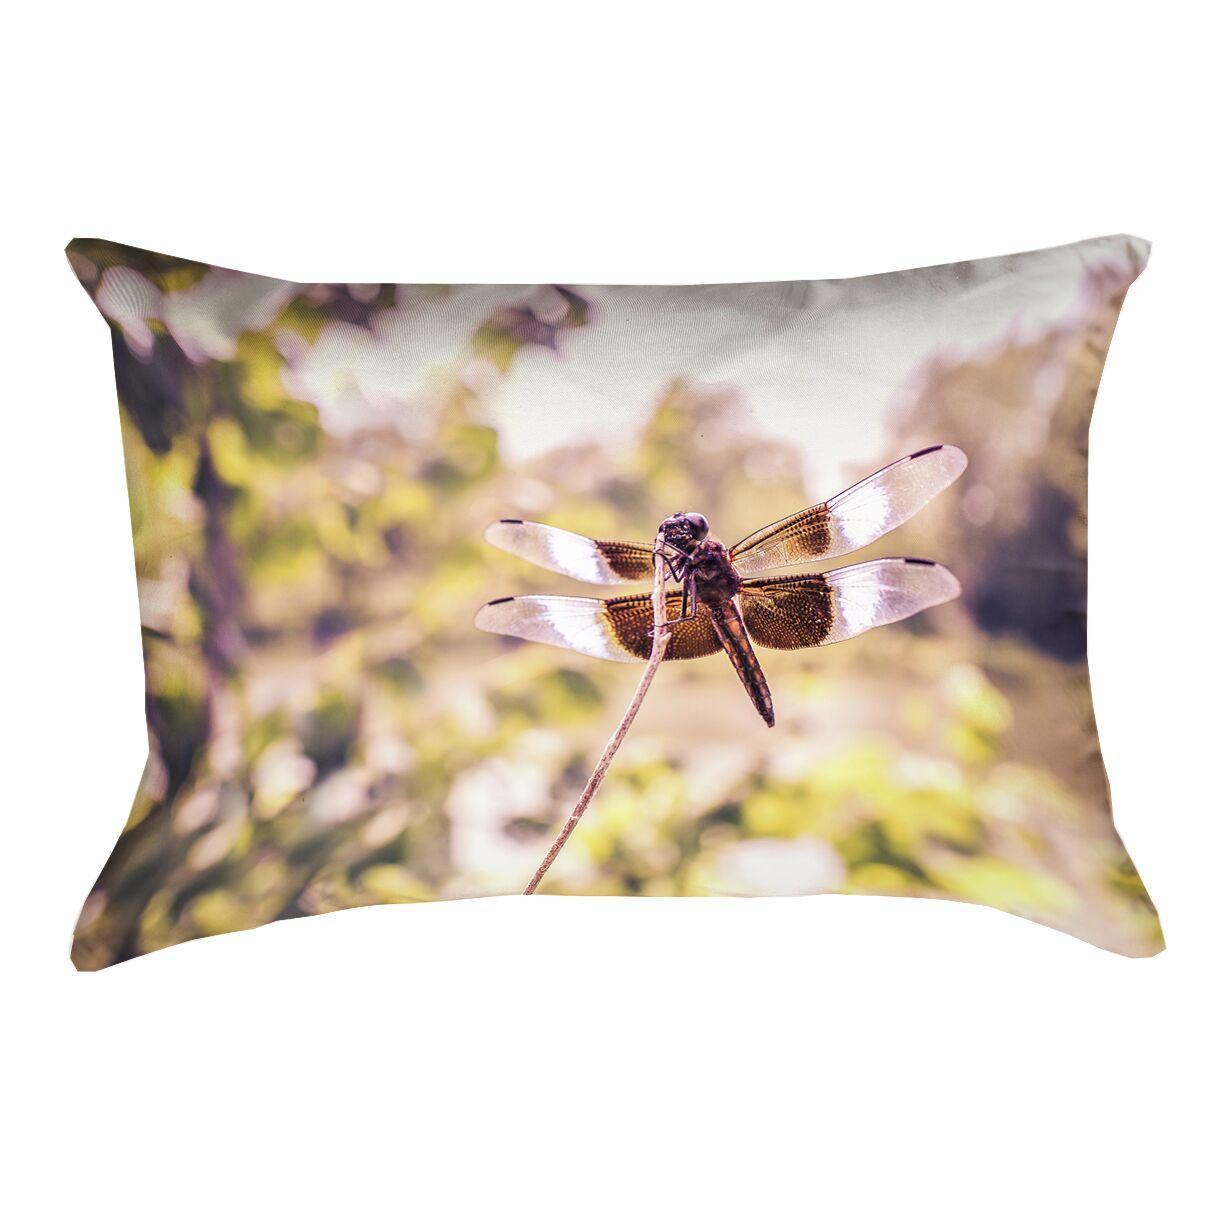 Hargis Dragonfly Indoor Euro Pillow